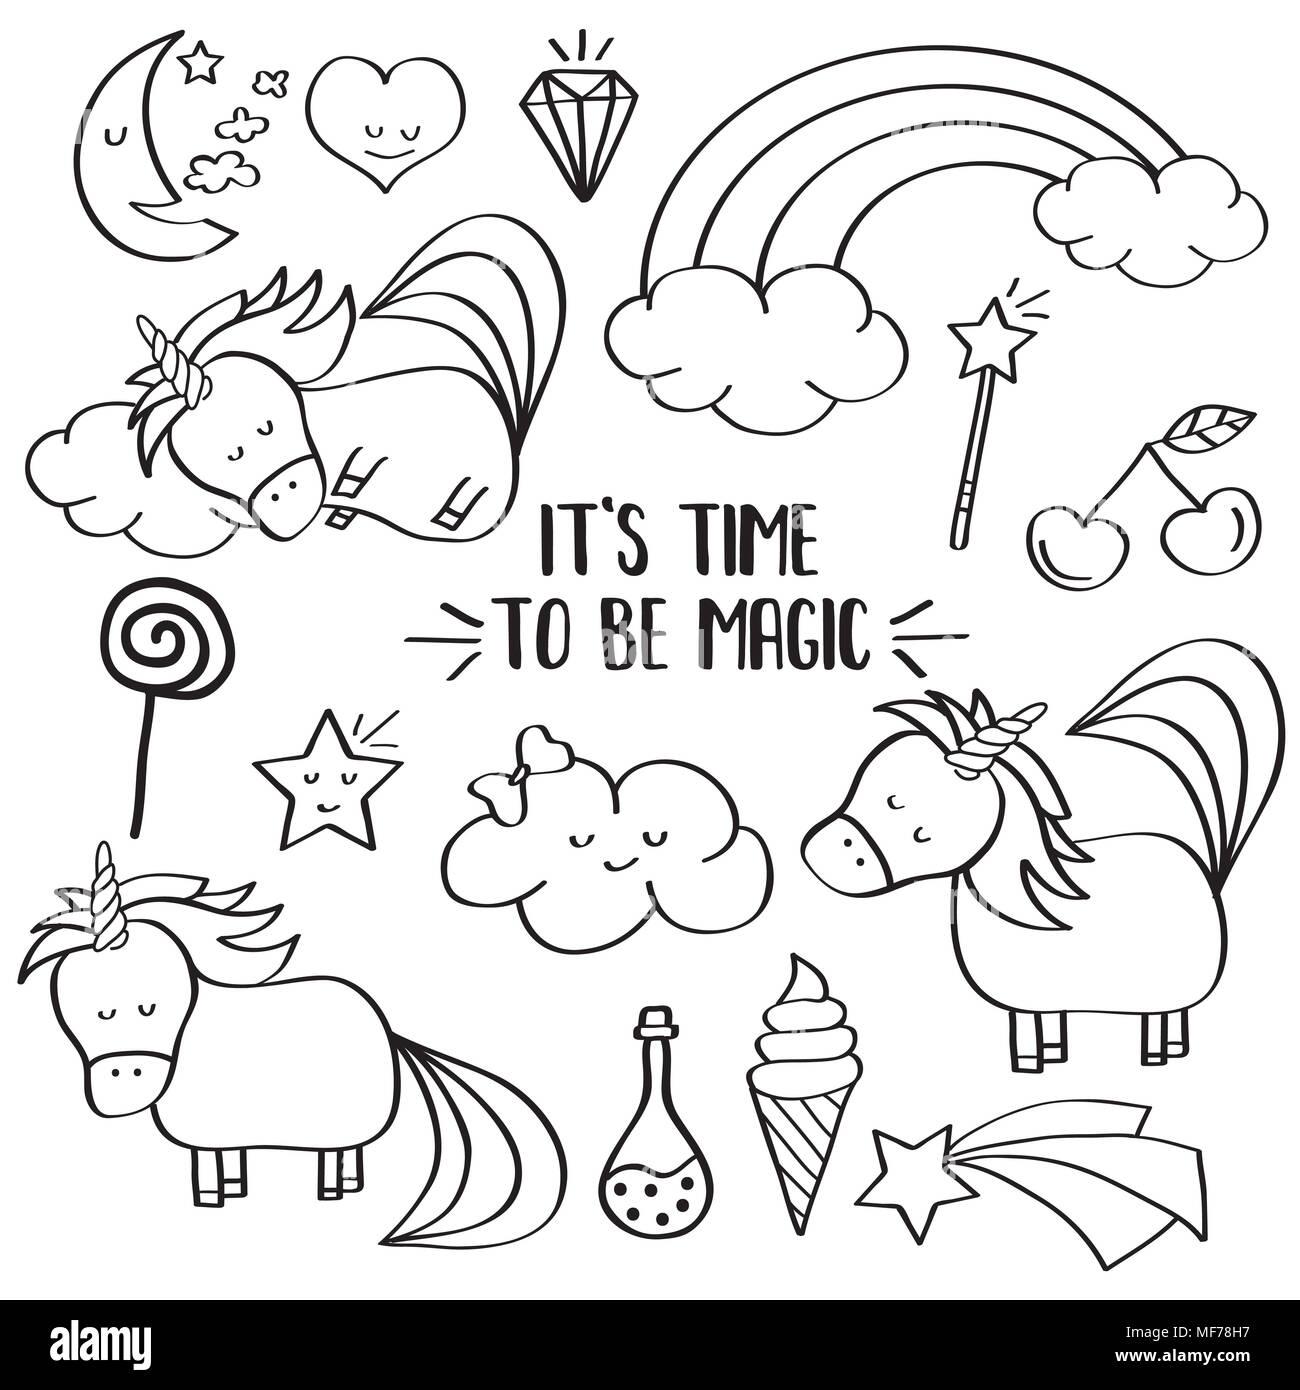 Imagenes De Unicornios Tumblr Para Colorear Imágenes De Unicornios